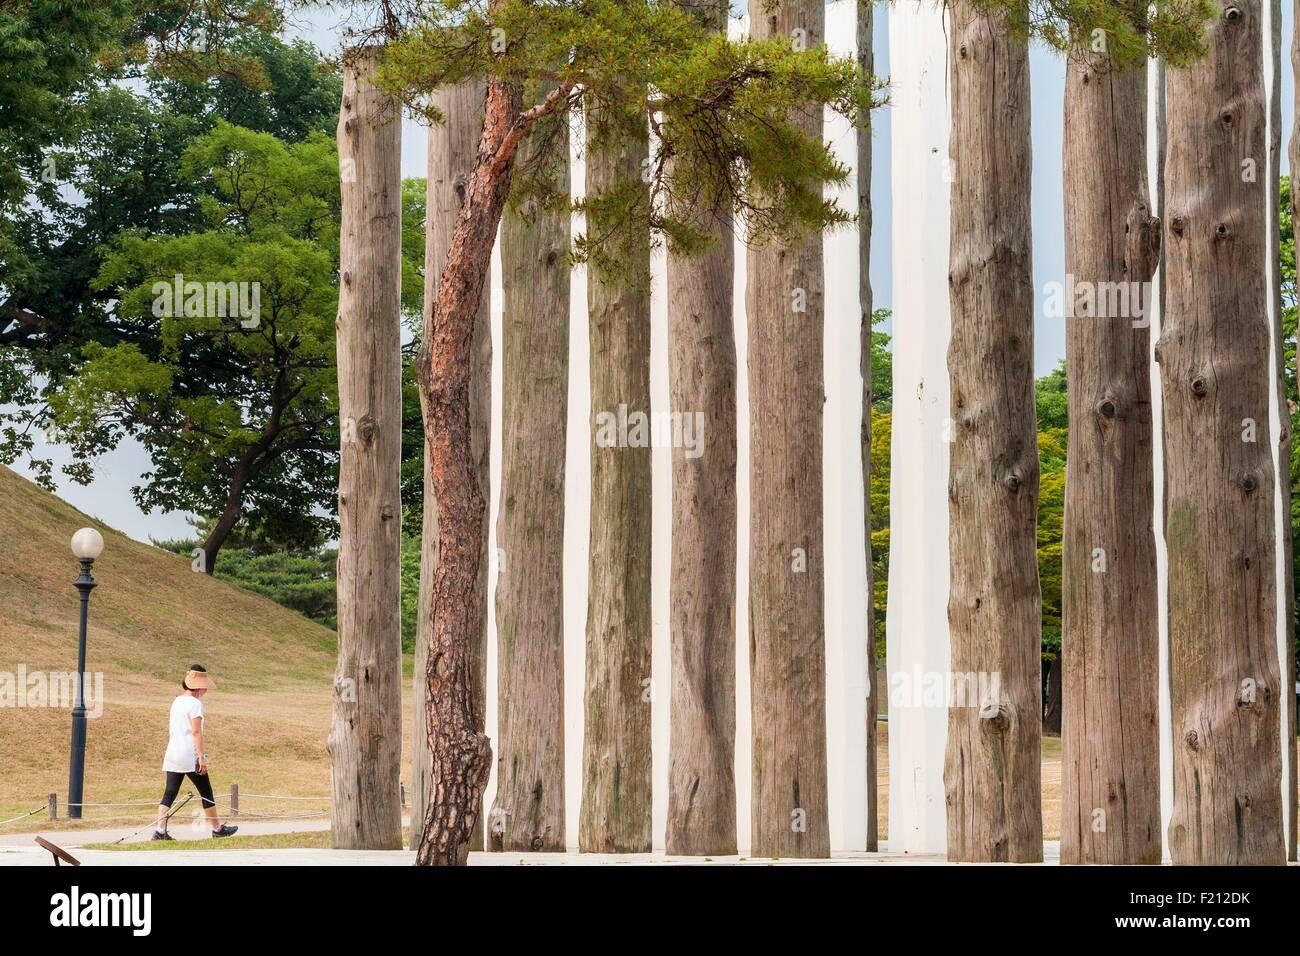 South Korea, Seoul, Songpa-gu, Olympic Park (Olpark), Olympic park built for the 1988 Olympic Games - Stock Image